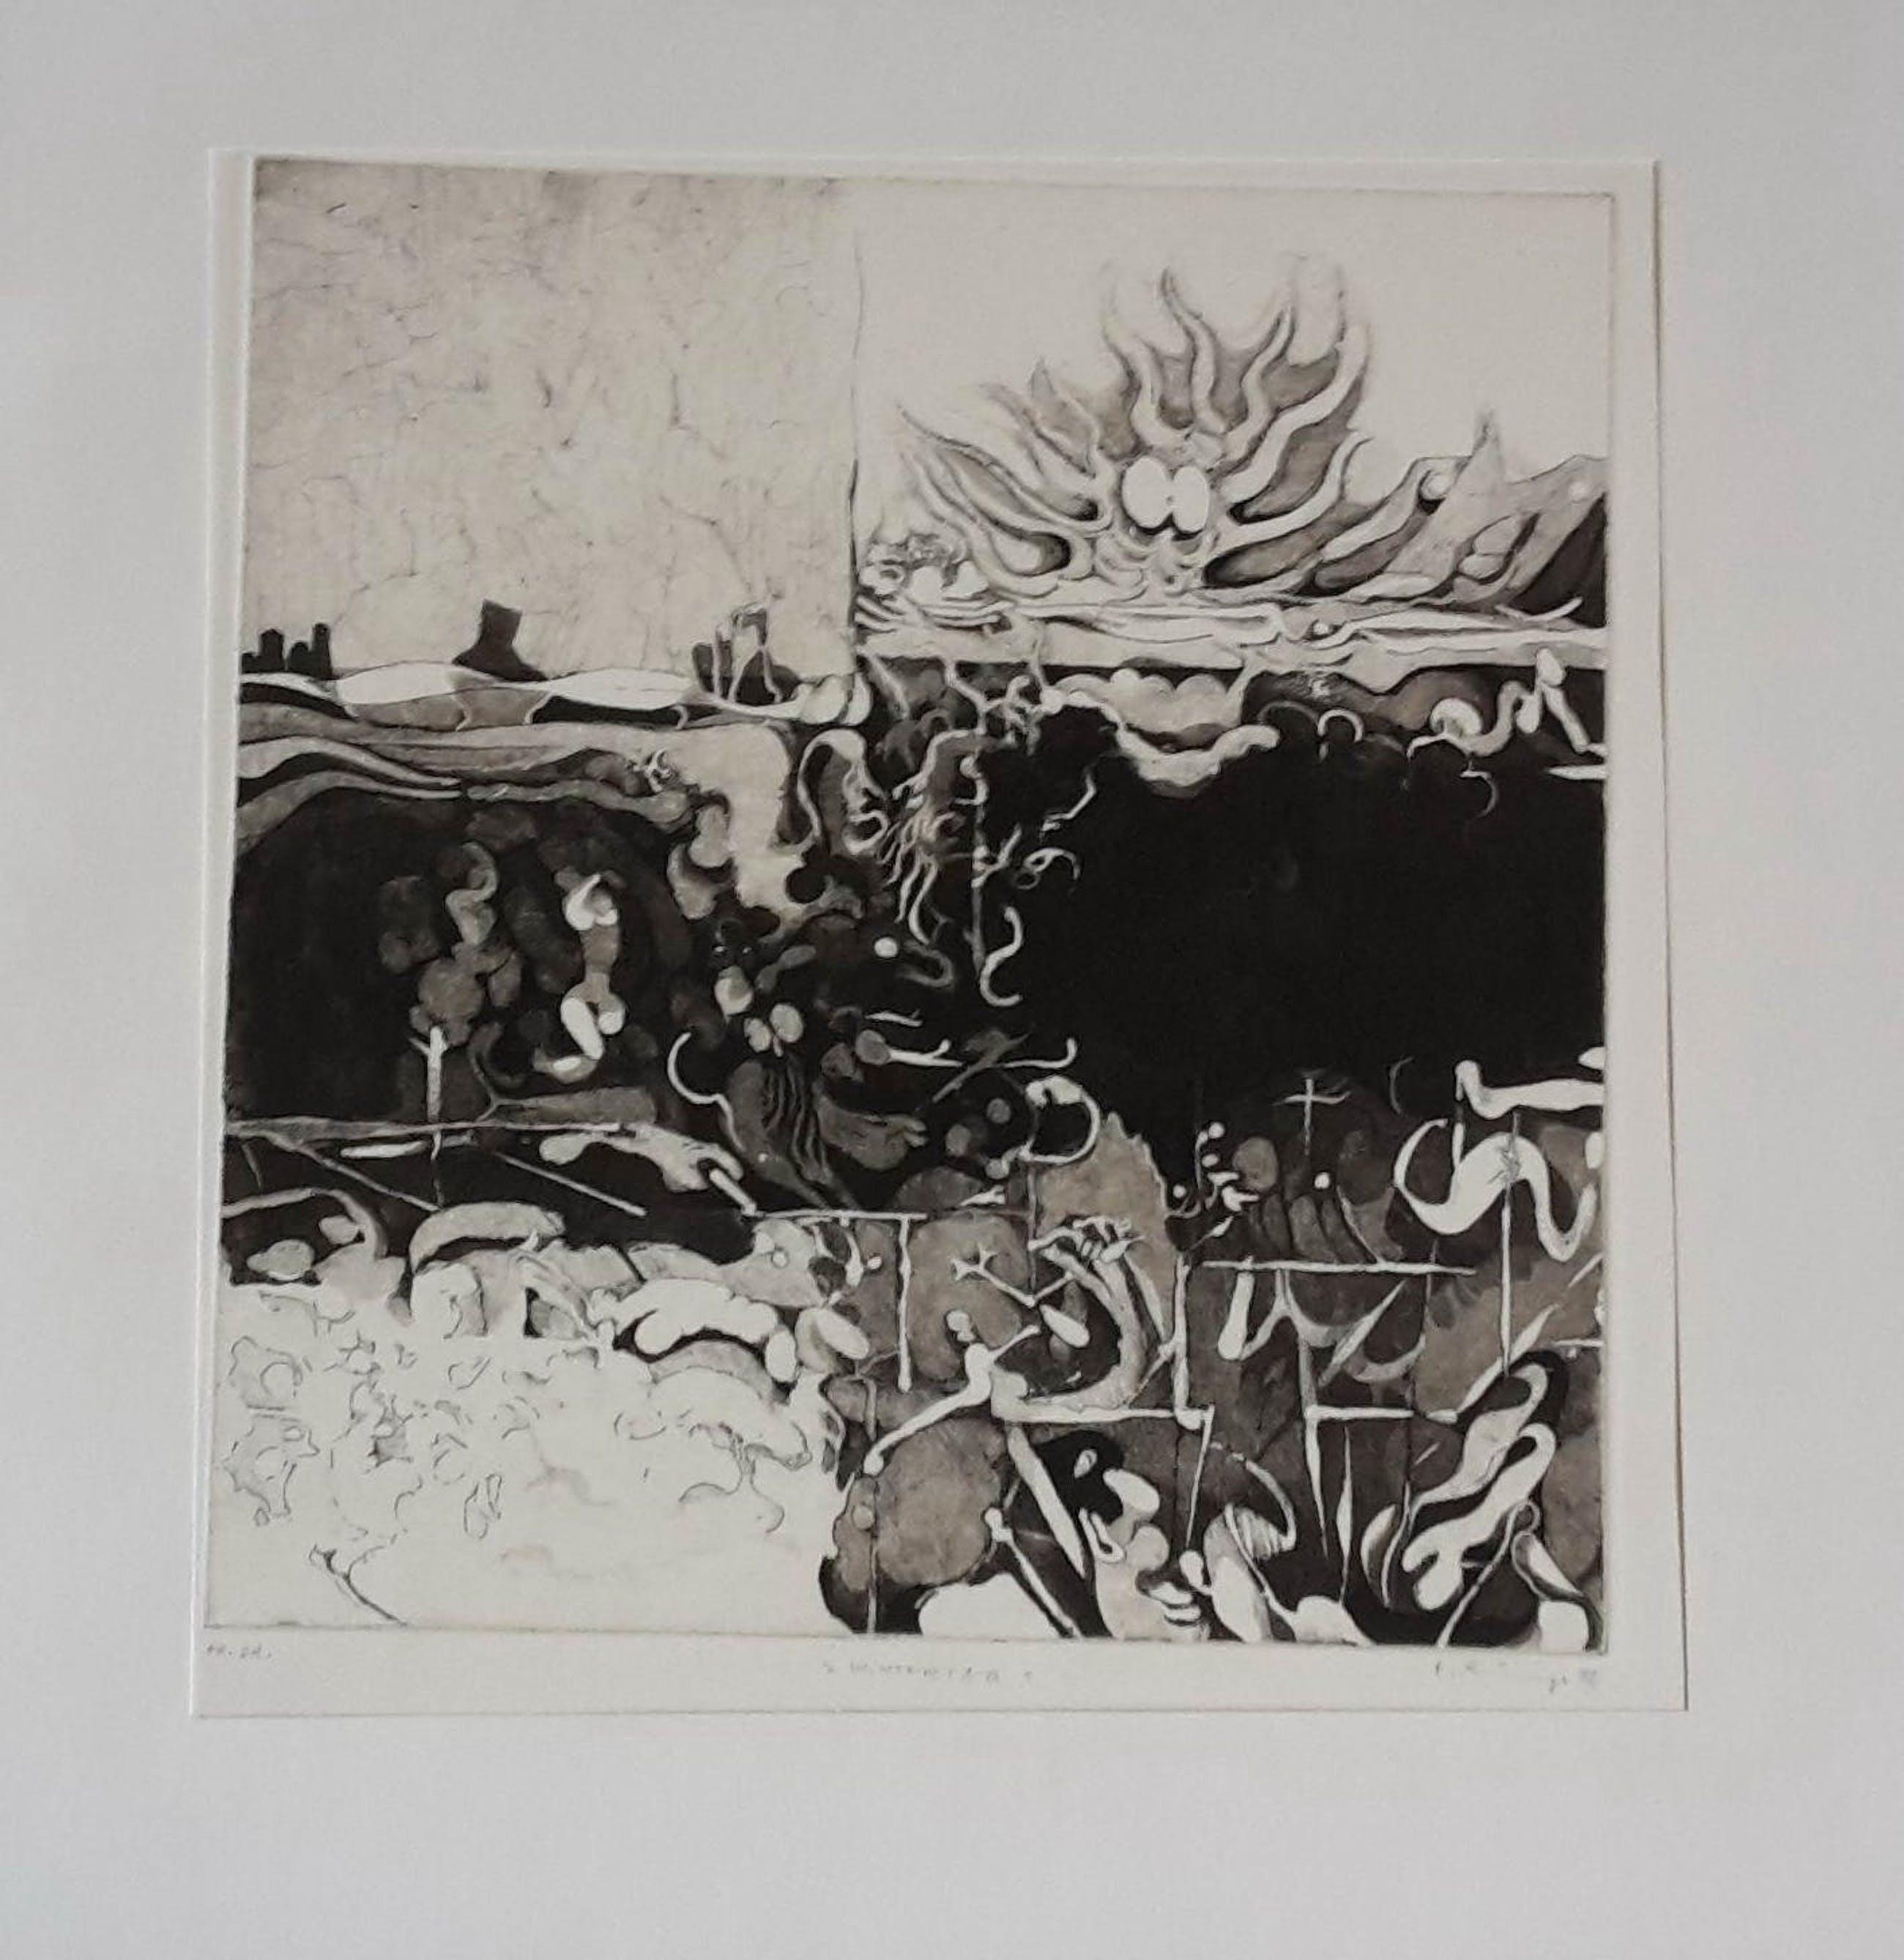 Holger Runge - Wintertag, ets, 1972 kopen? Bied vanaf 40!